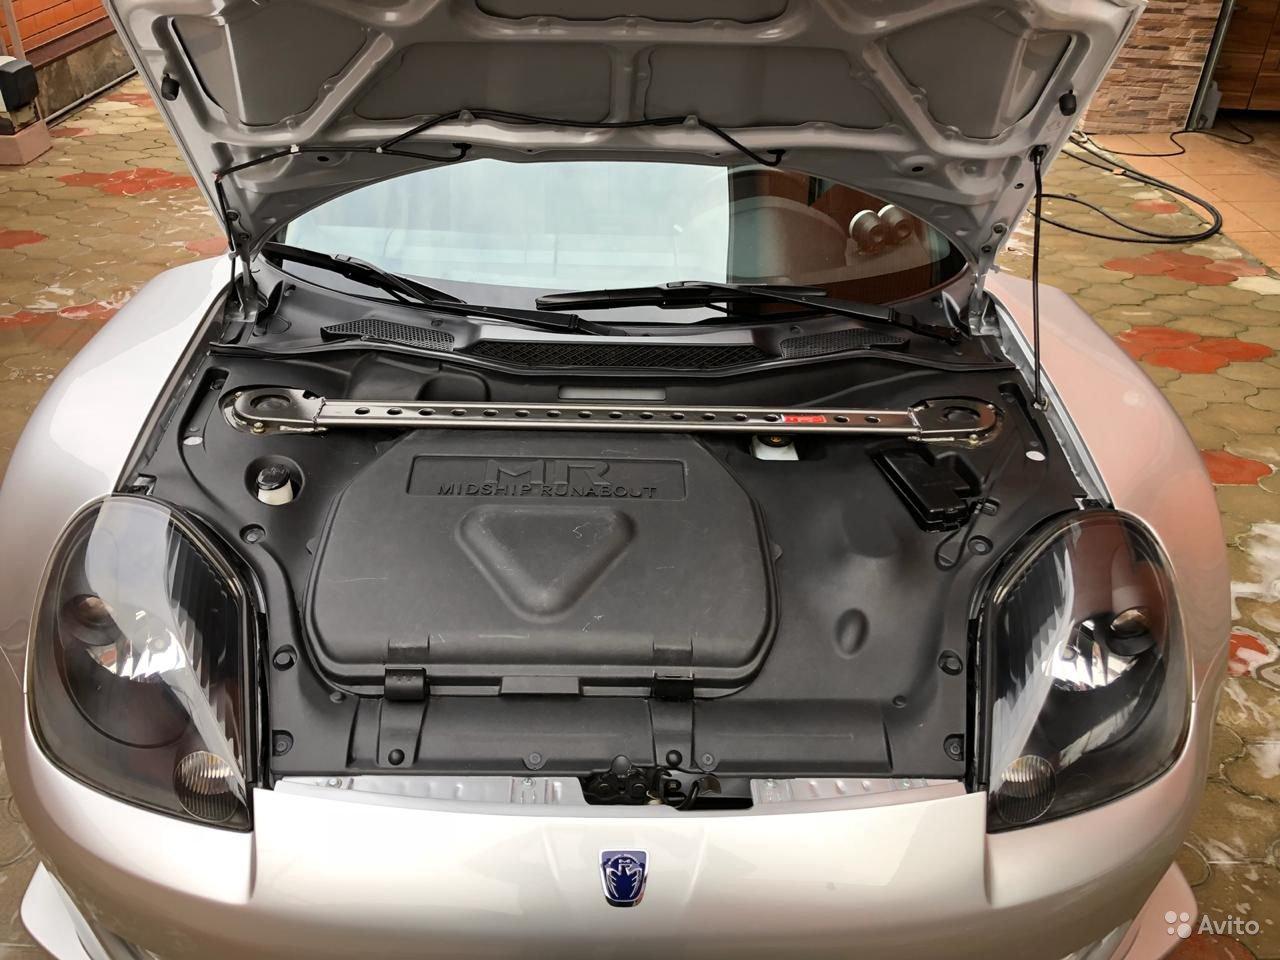 2001-Toyota-MR2-TTE-Turbo-12